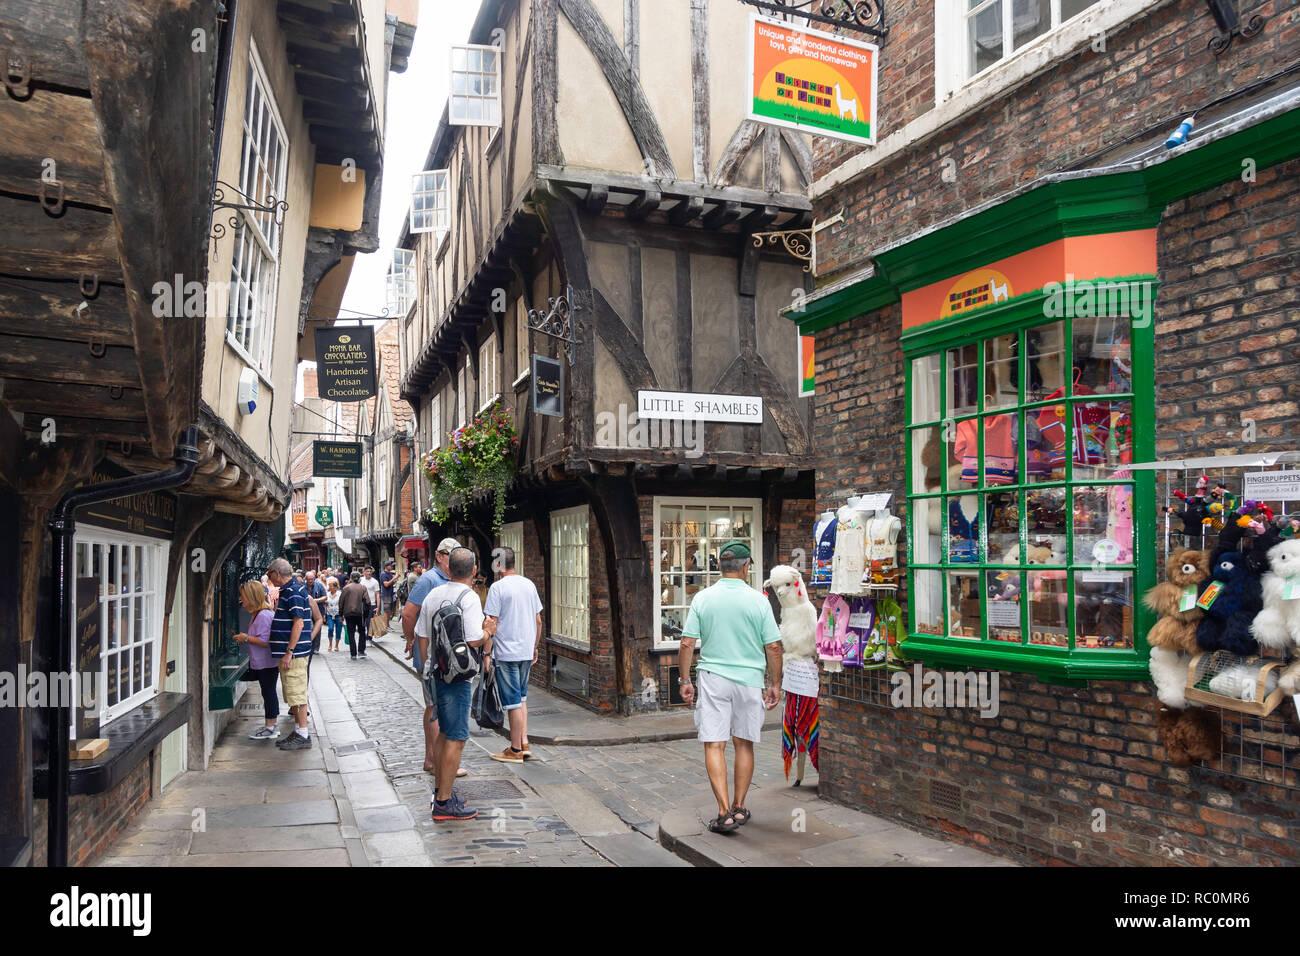 'The Shambles' medieval street, Newgate, York, North Yorkshire, England, United Kingdom Stock Photo